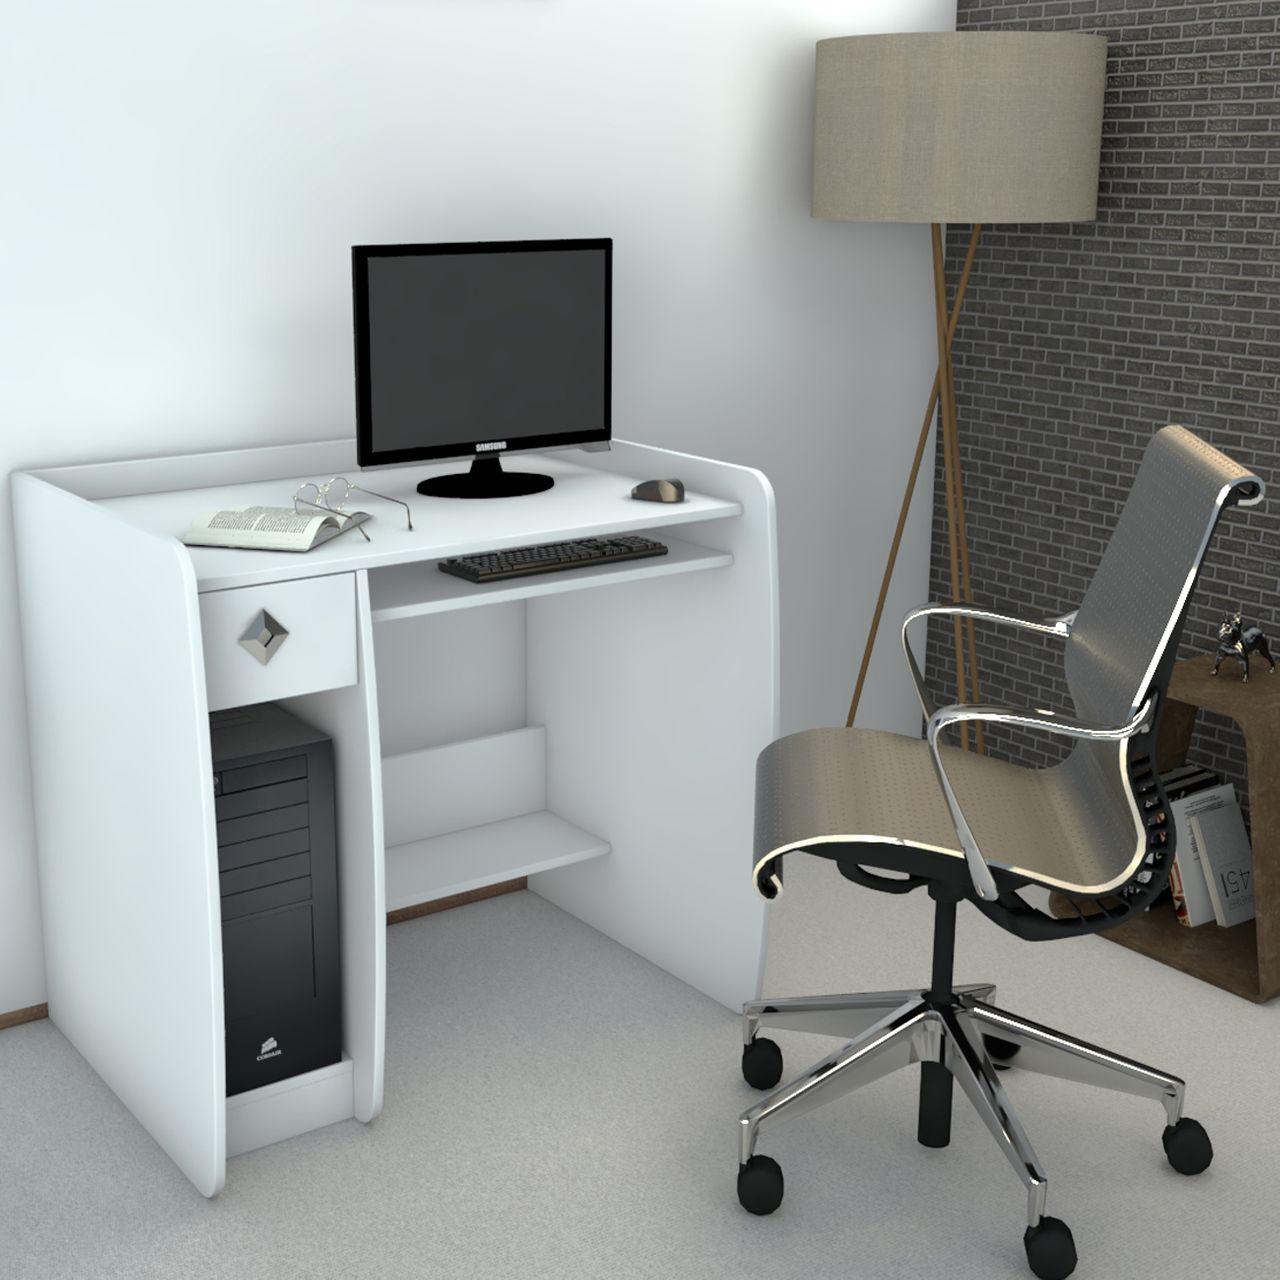 میز کامپیوتر انتخاب اول مدل TO-285